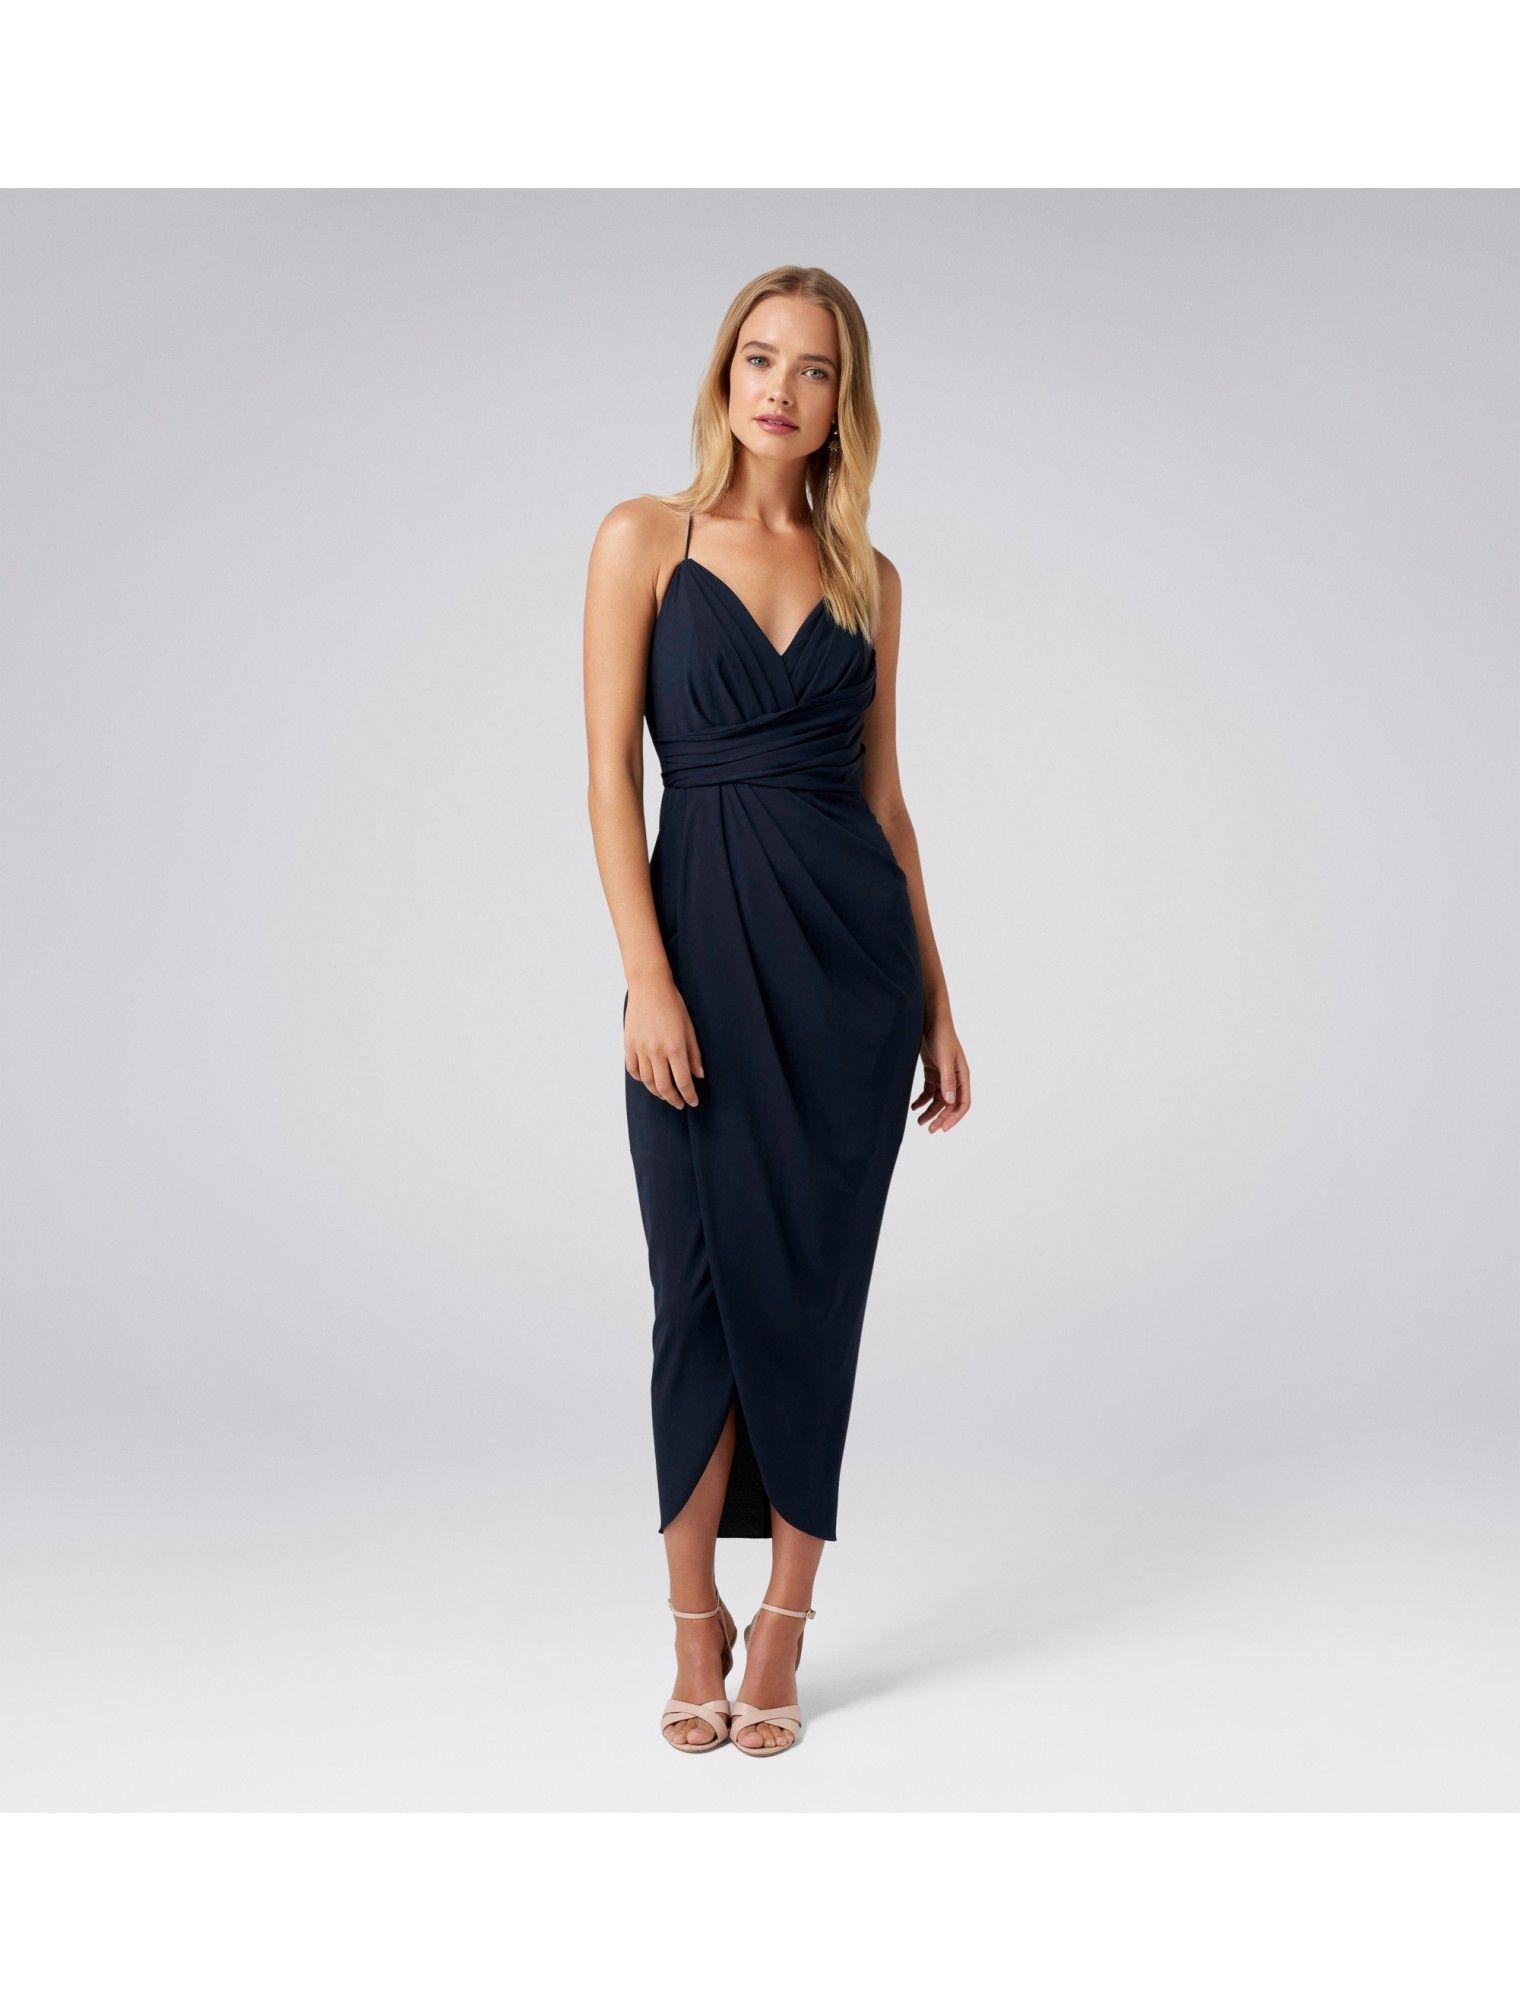 62ee839228a Charlotte Drape Maxi Dress Navy - Womens Fashion